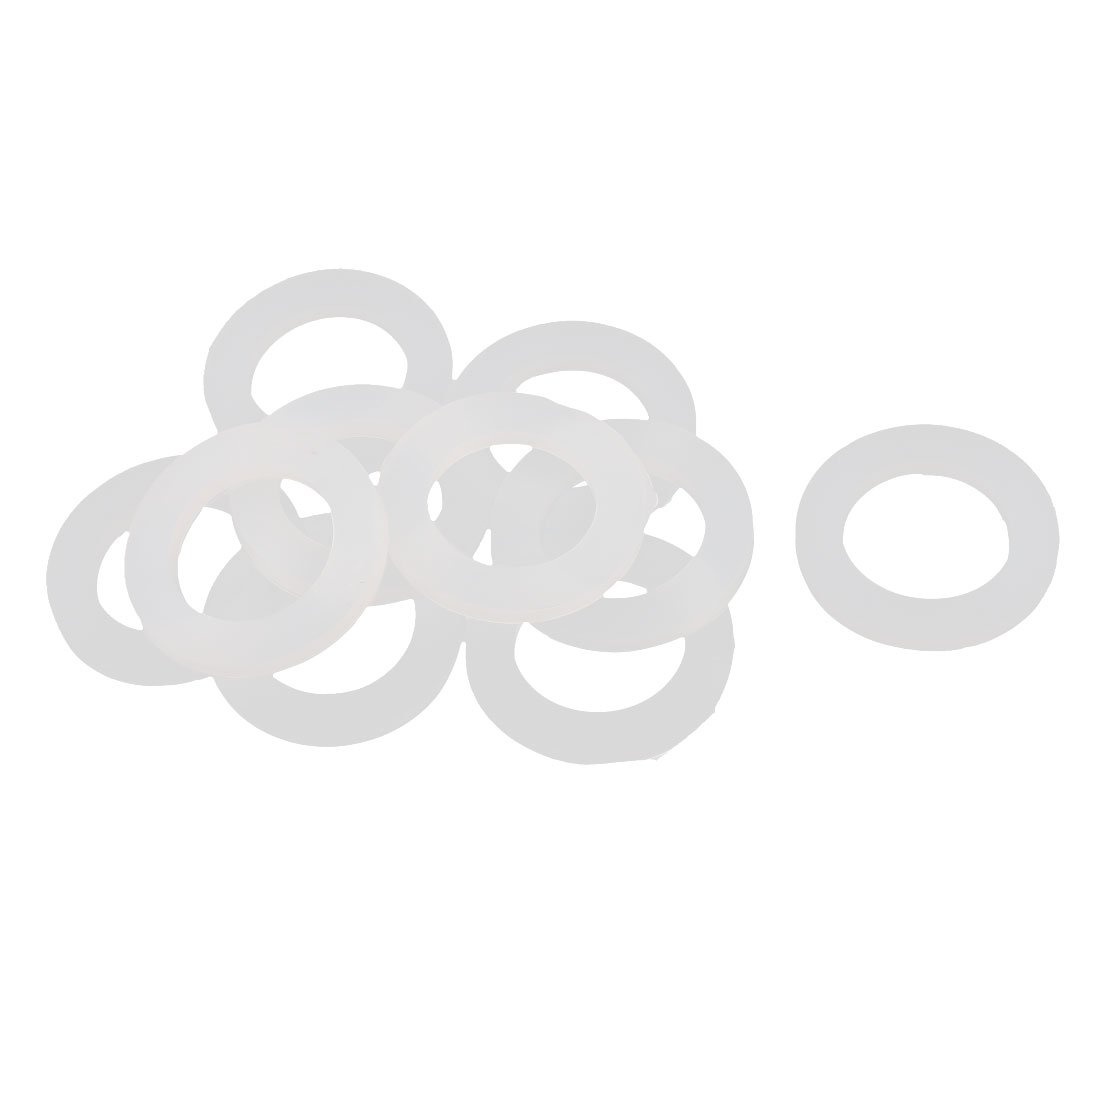 Sourcingmap 10St/ück 40mm x 2mm Flexible Filter Gummi-O-Ring-Dichtung Schwarz DE de